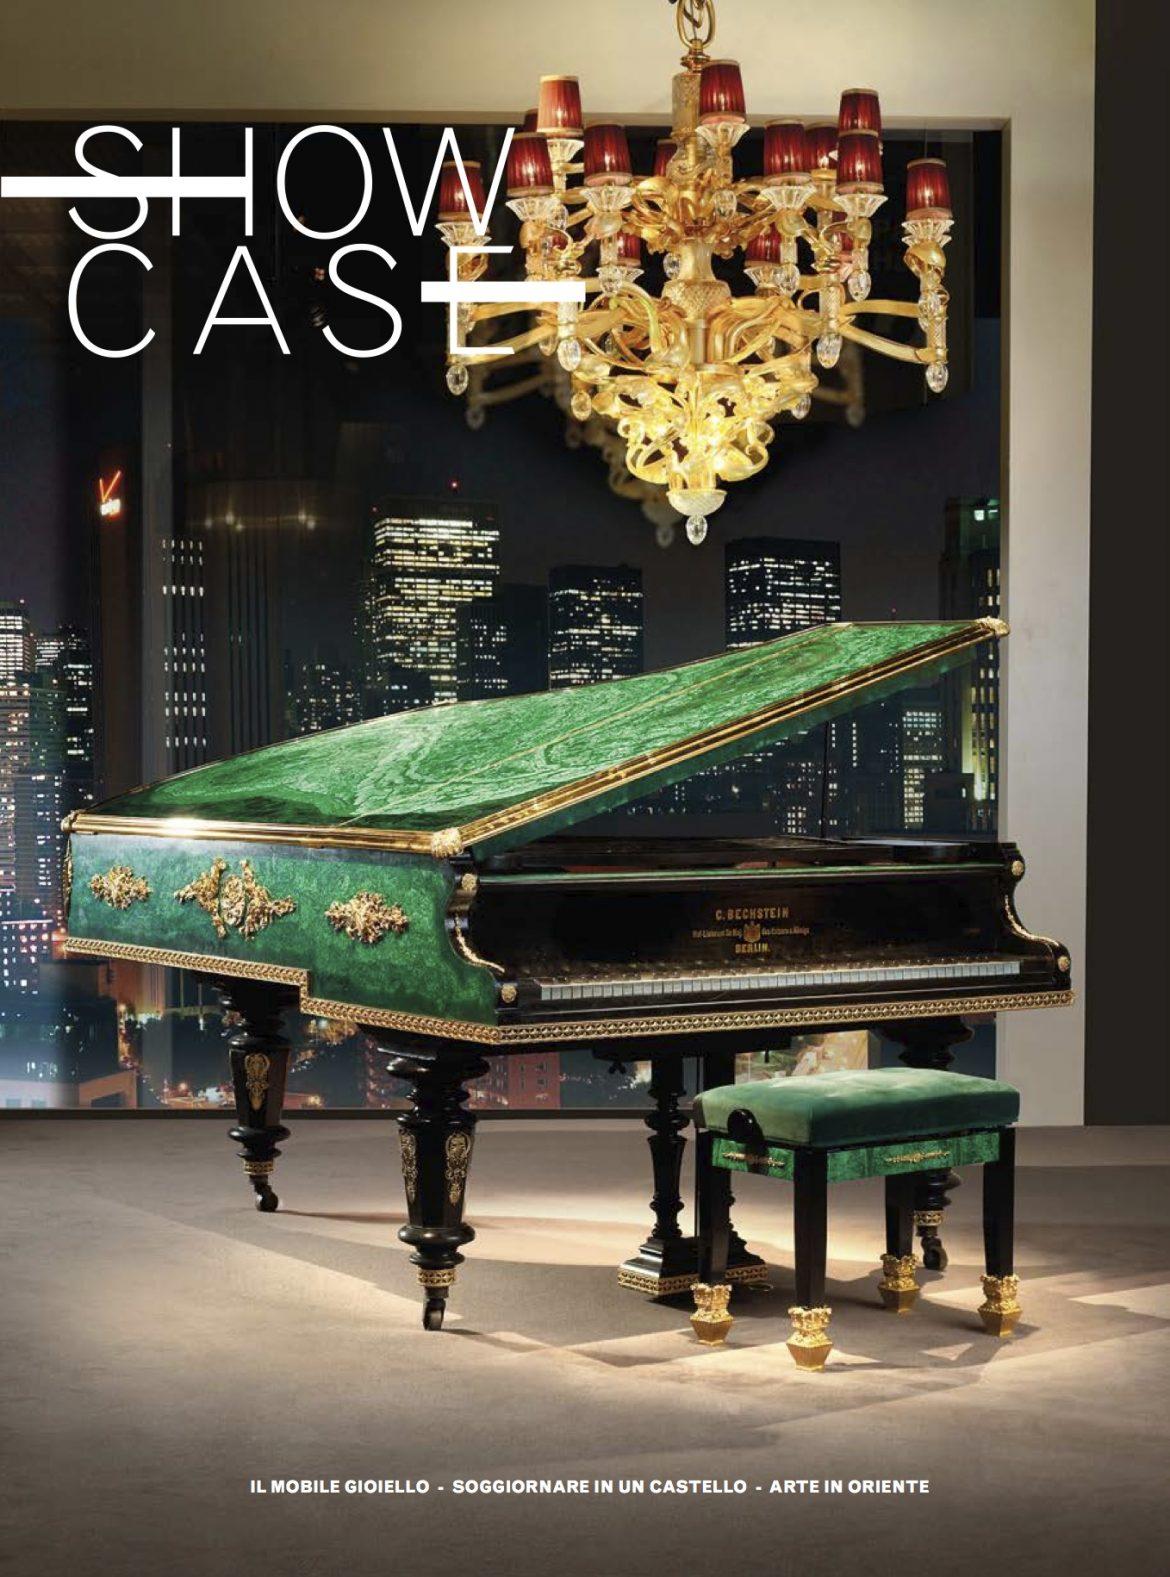 maison et objet americas 2015 info and exhibitors list. Black Bedroom Furniture Sets. Home Design Ideas